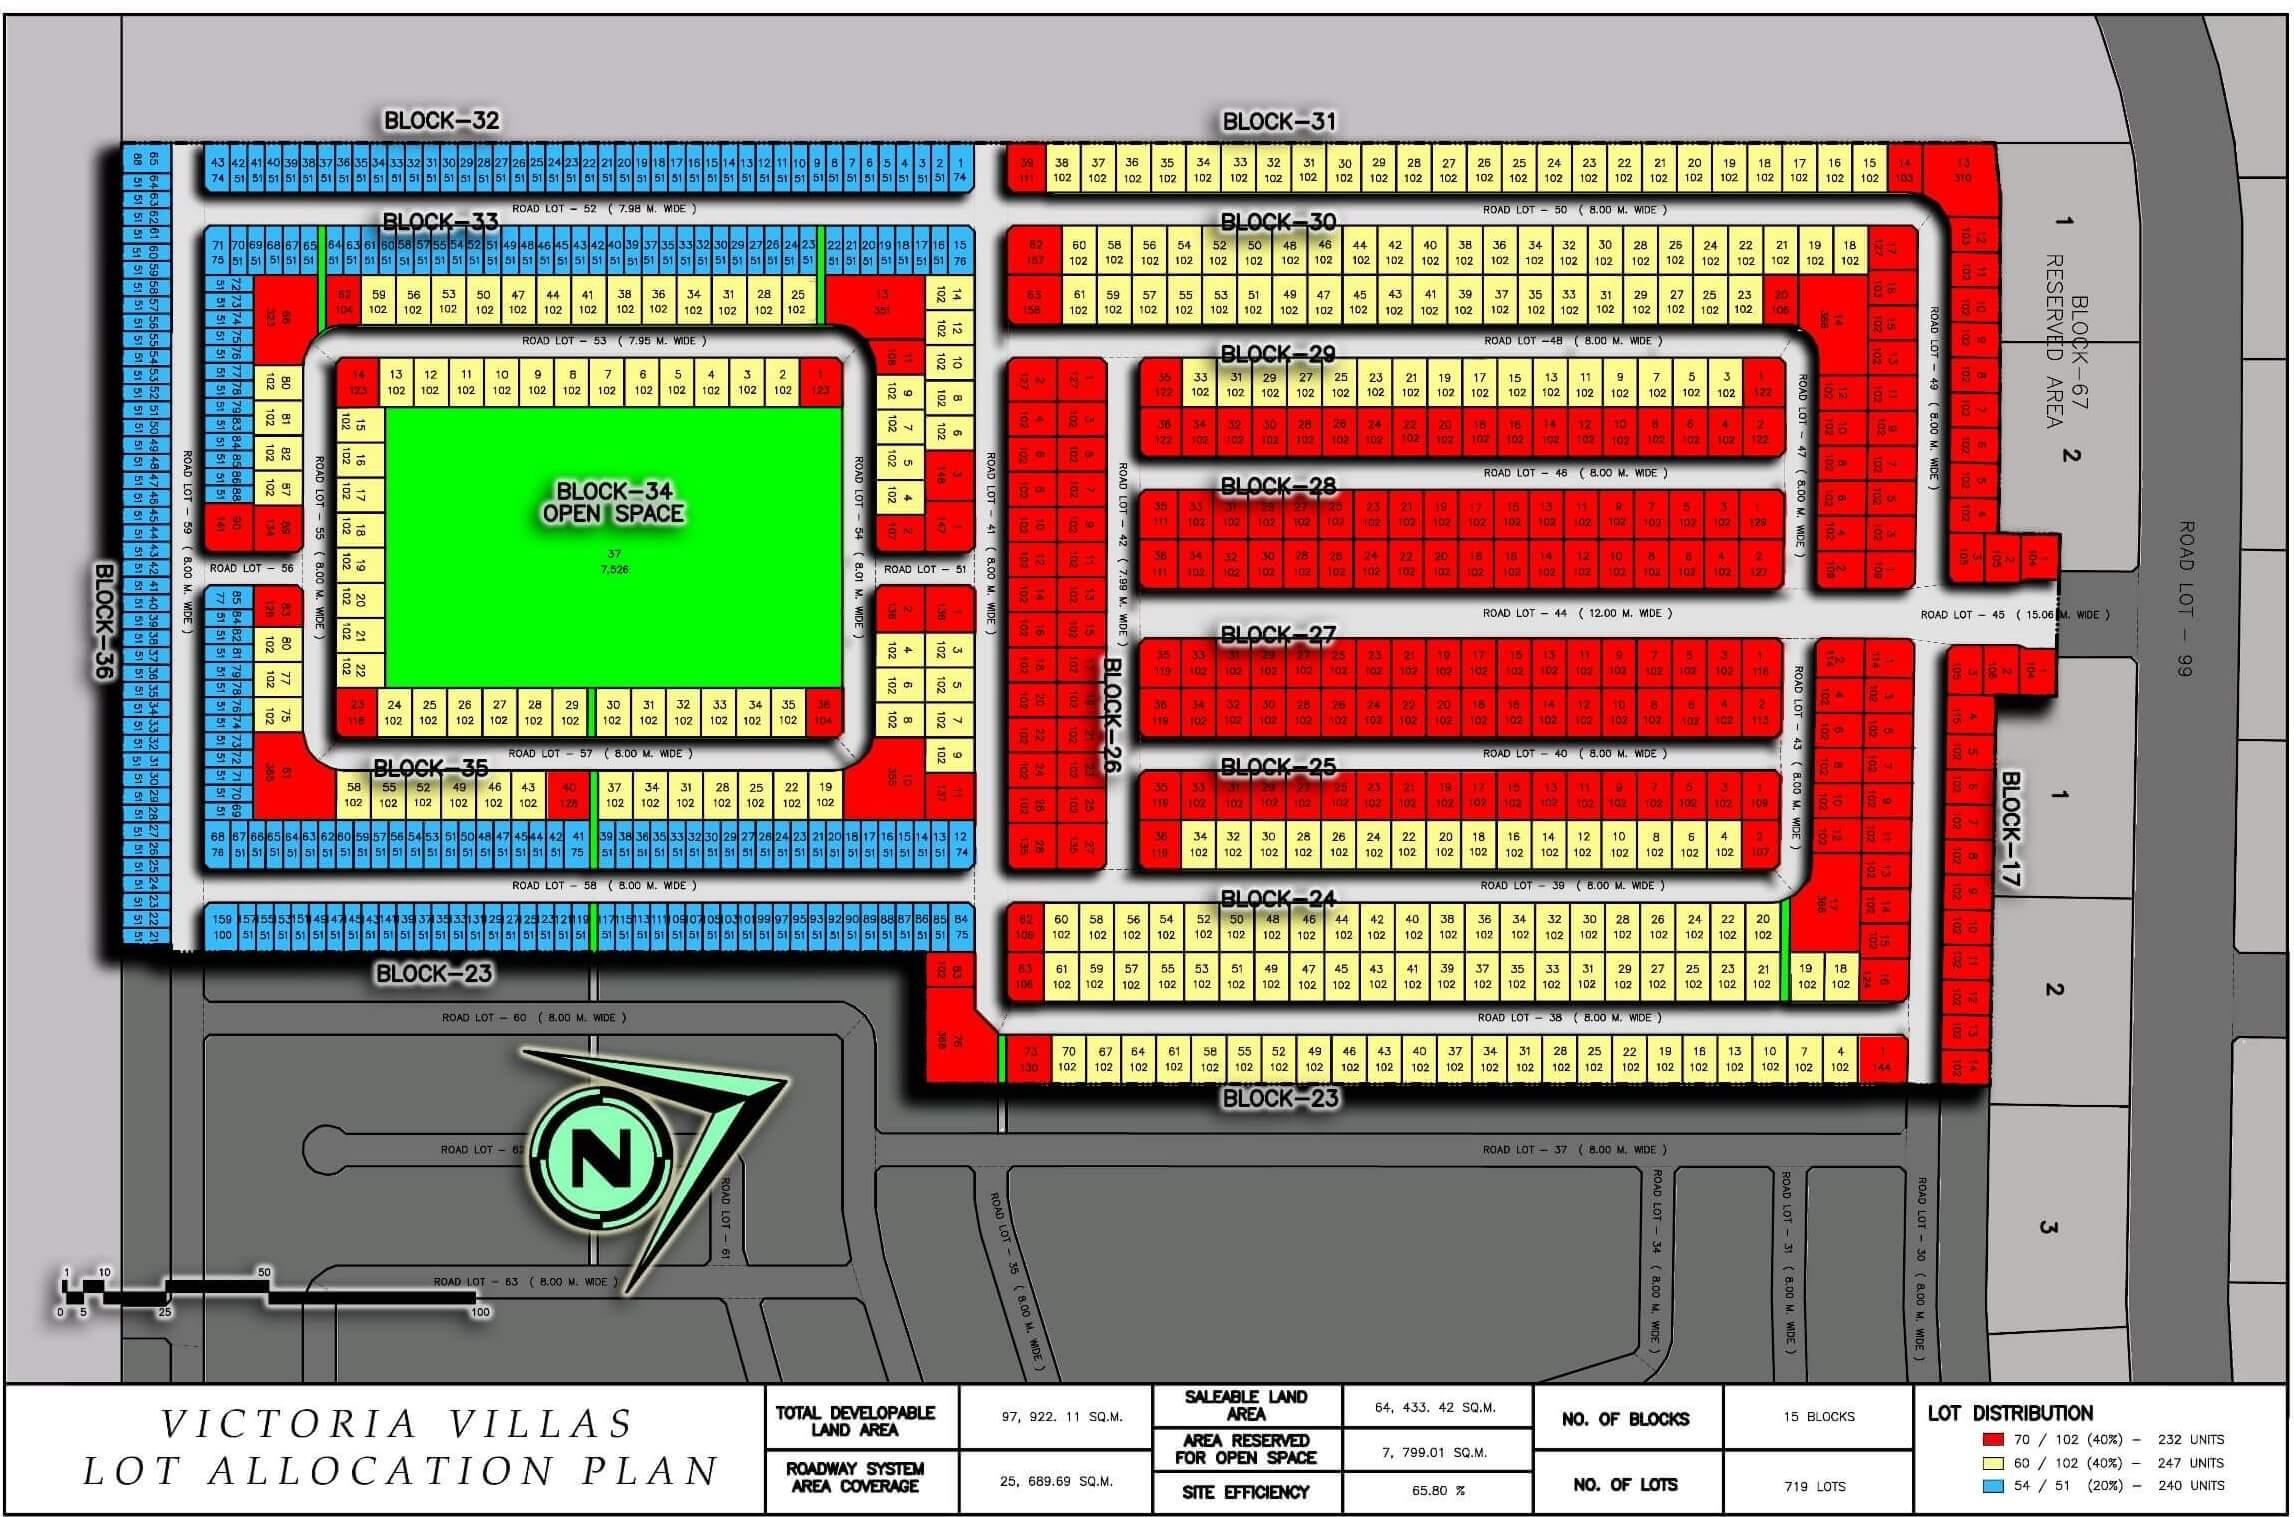 Victoria Villas Lot Map